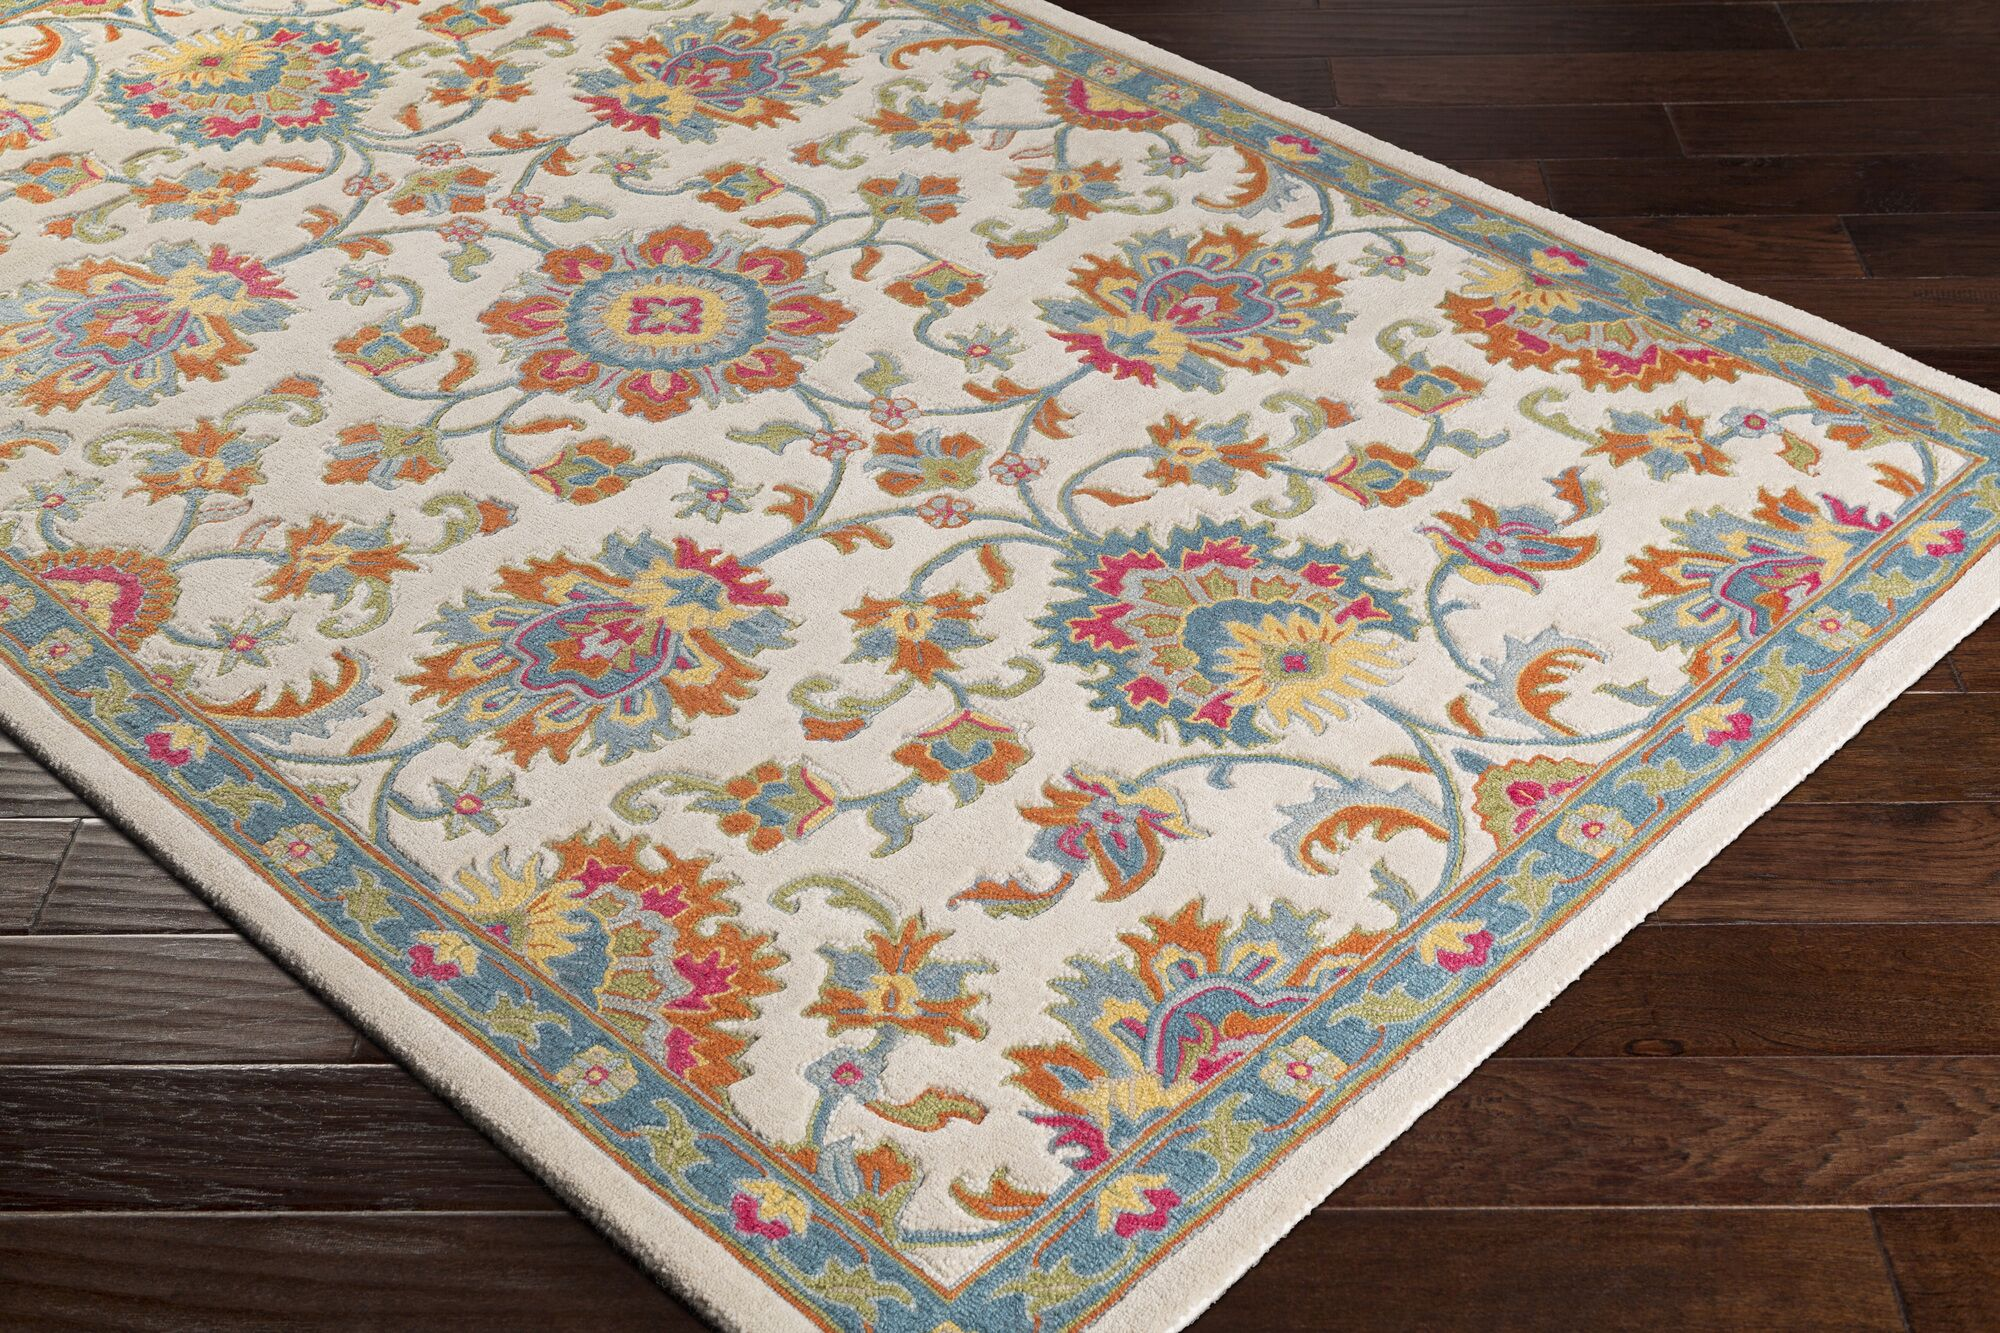 Edgerly Hand Tufted Wool Burnt Orange/Cream/Aqua Area Rug Rug Size: Rectangle 5' x 7'6